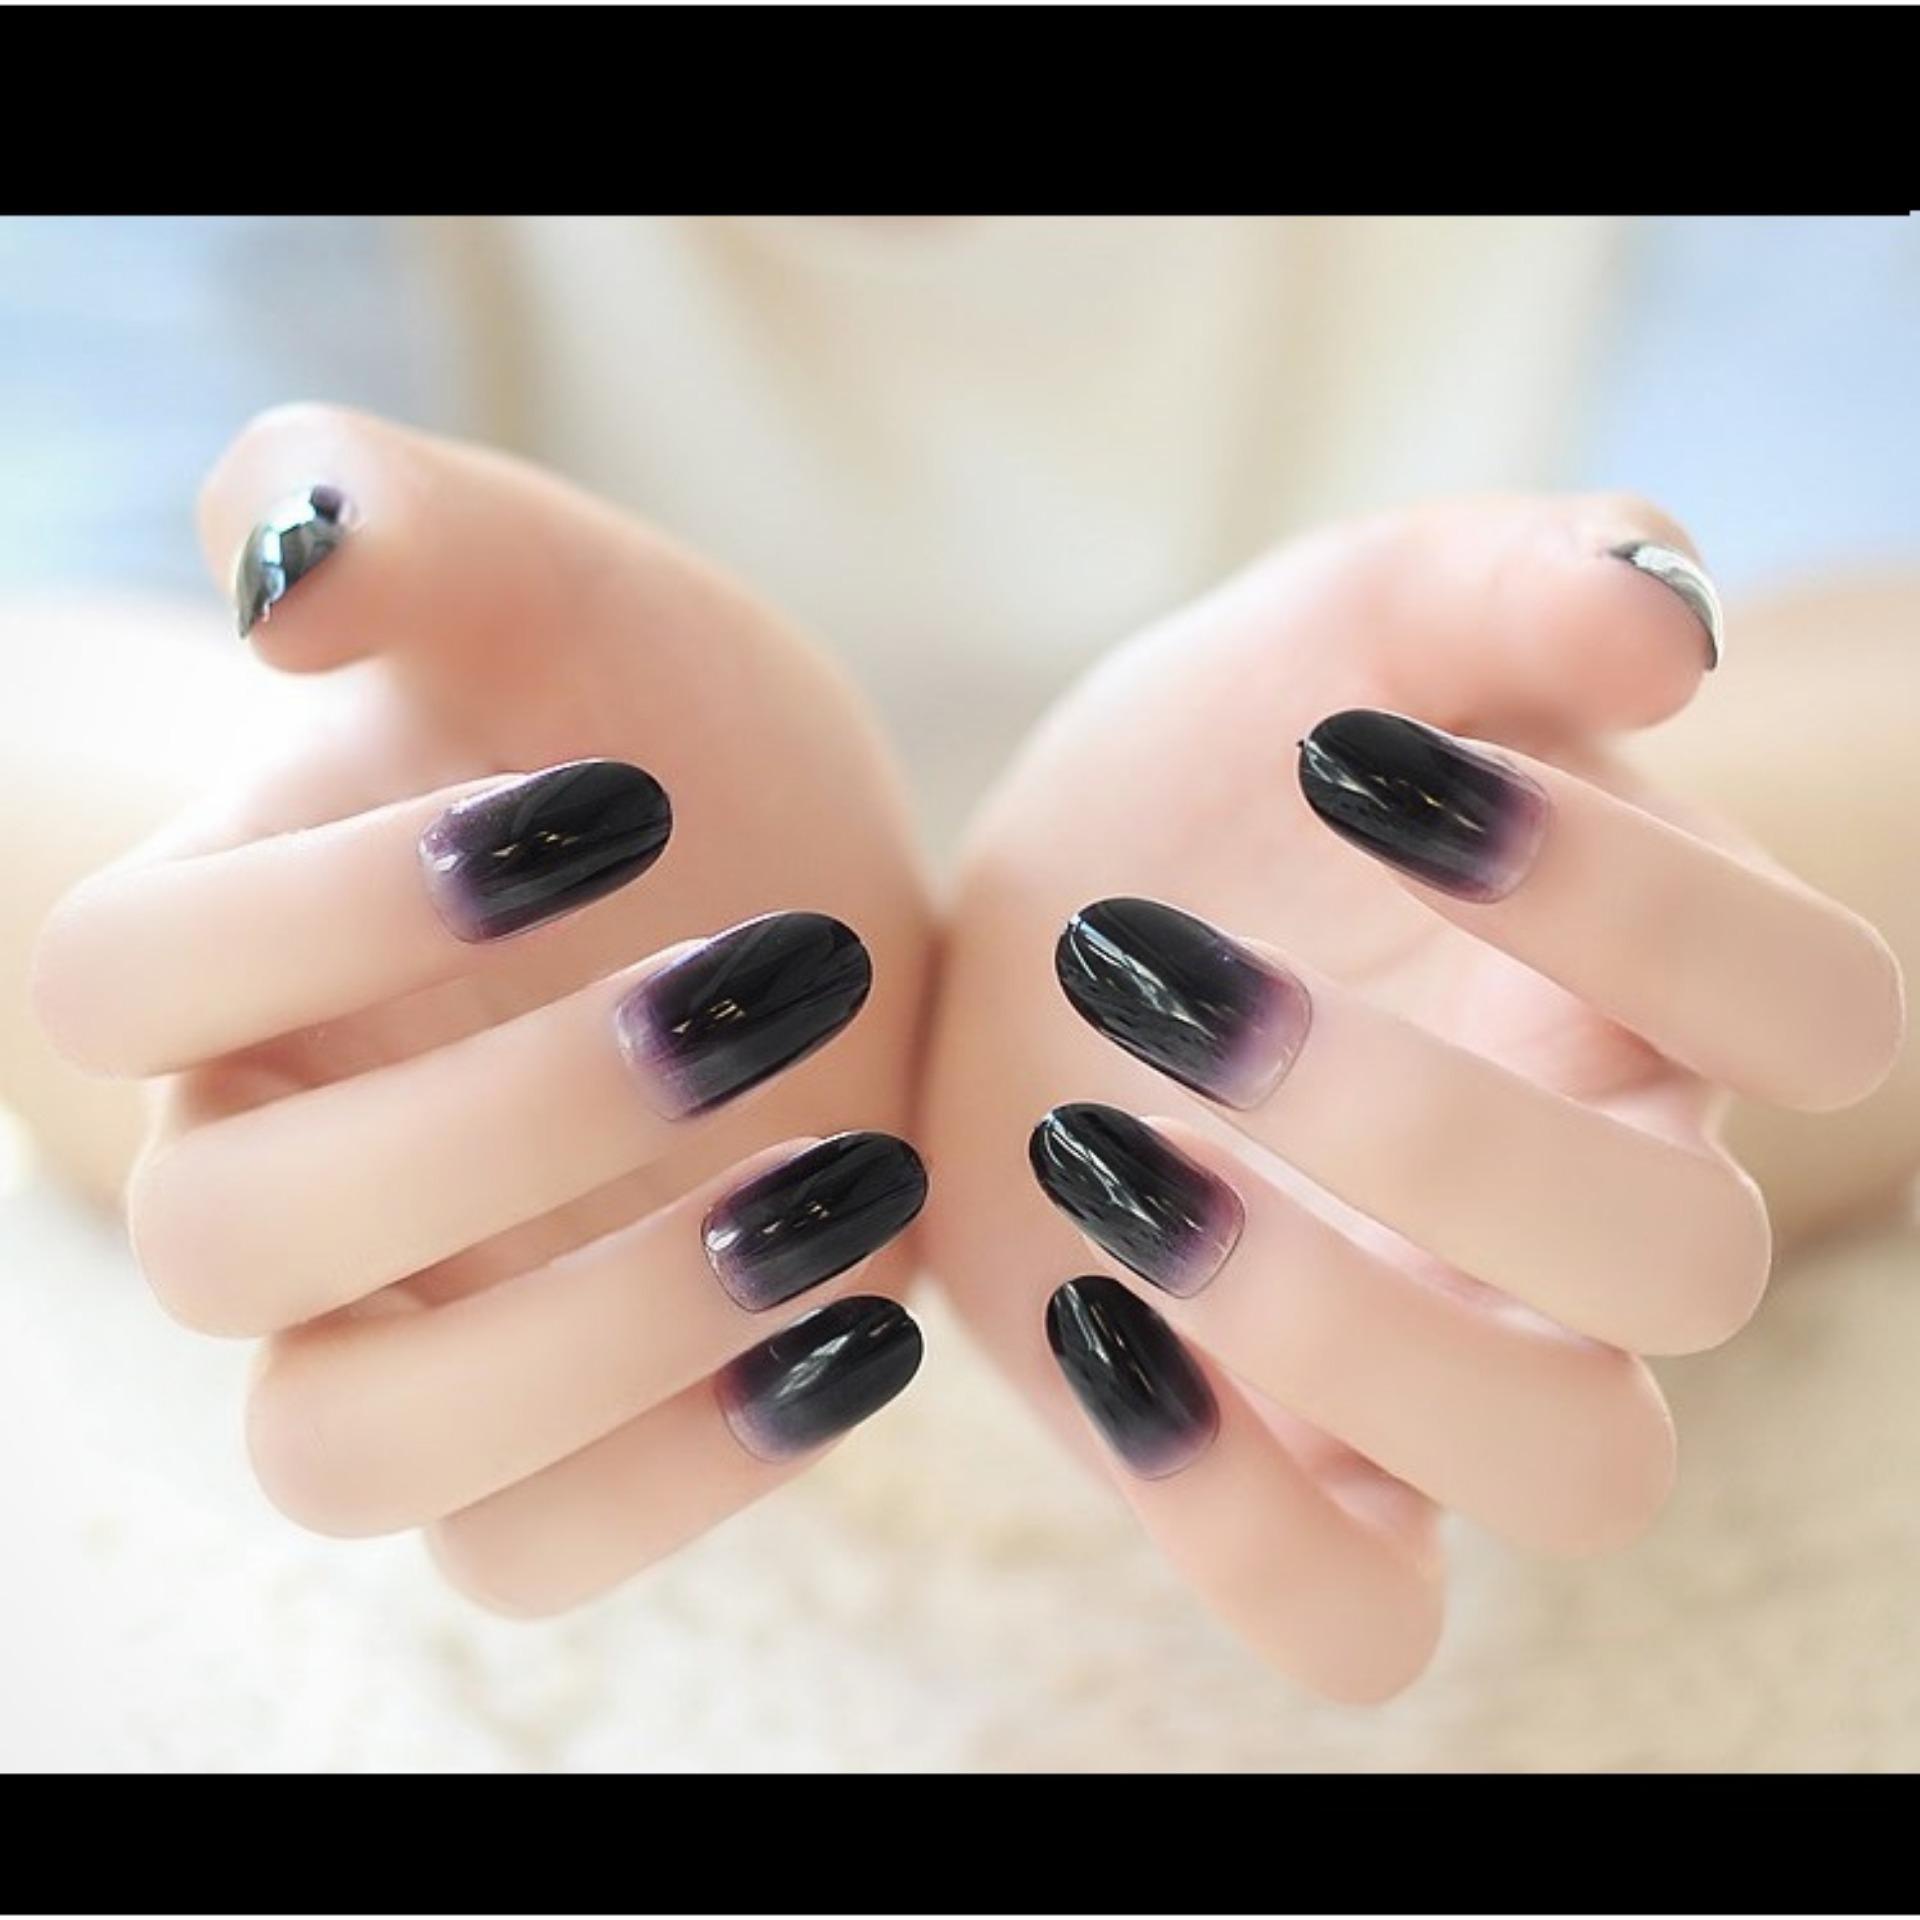 Fitur Jbs Nails Kuku Palsu Pengantin 3d A65 Dan Harga Terbaru Wedding Fake Nail Art Simple A13 Pernikahan Black A5